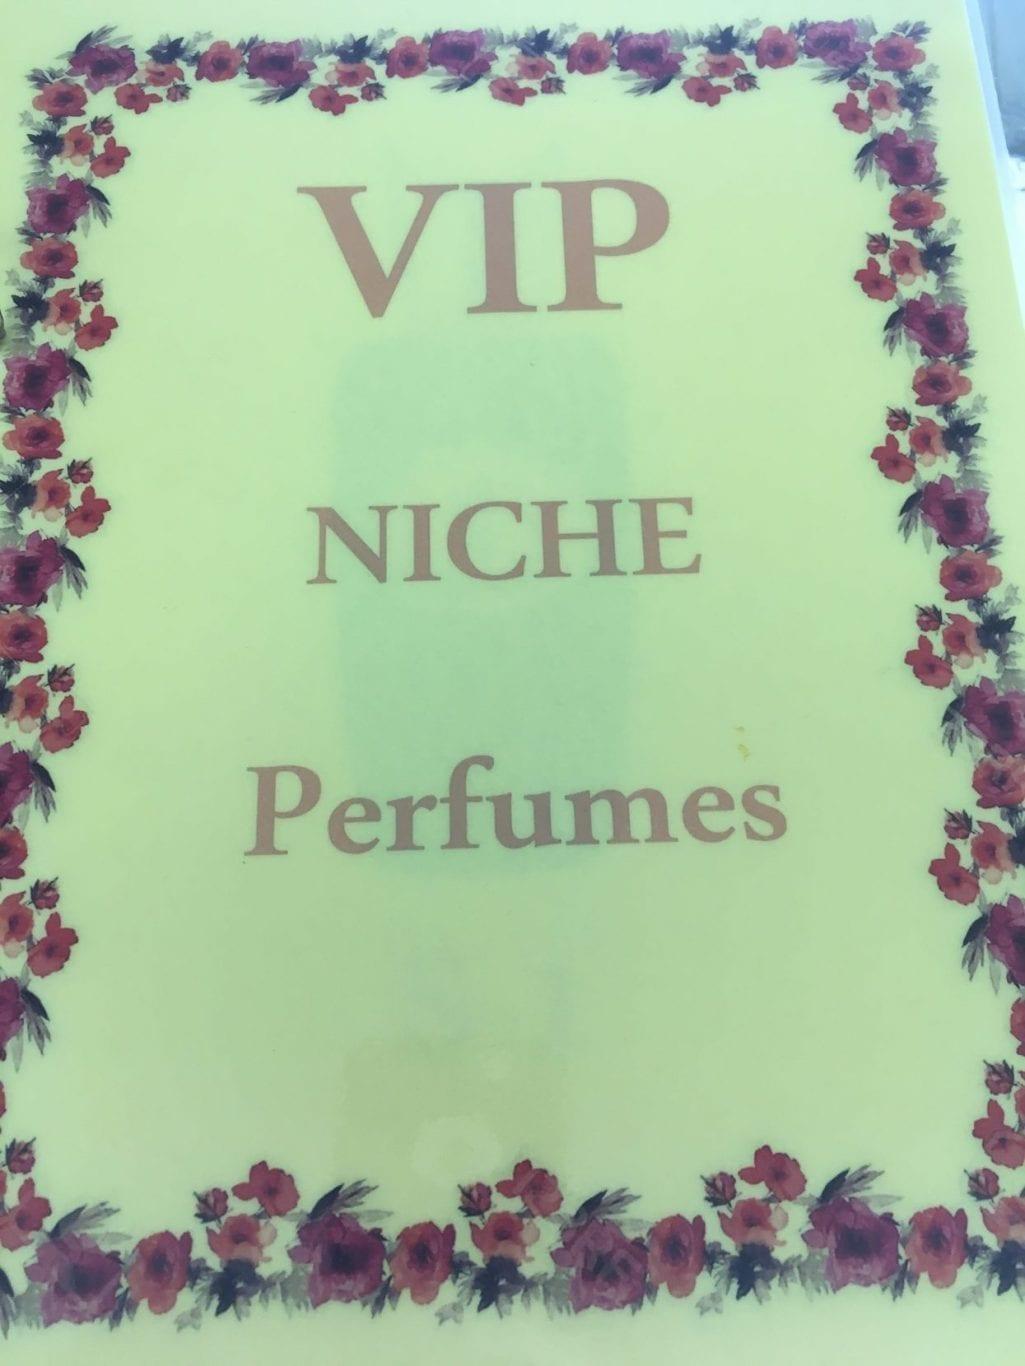 Vip niche perfumes